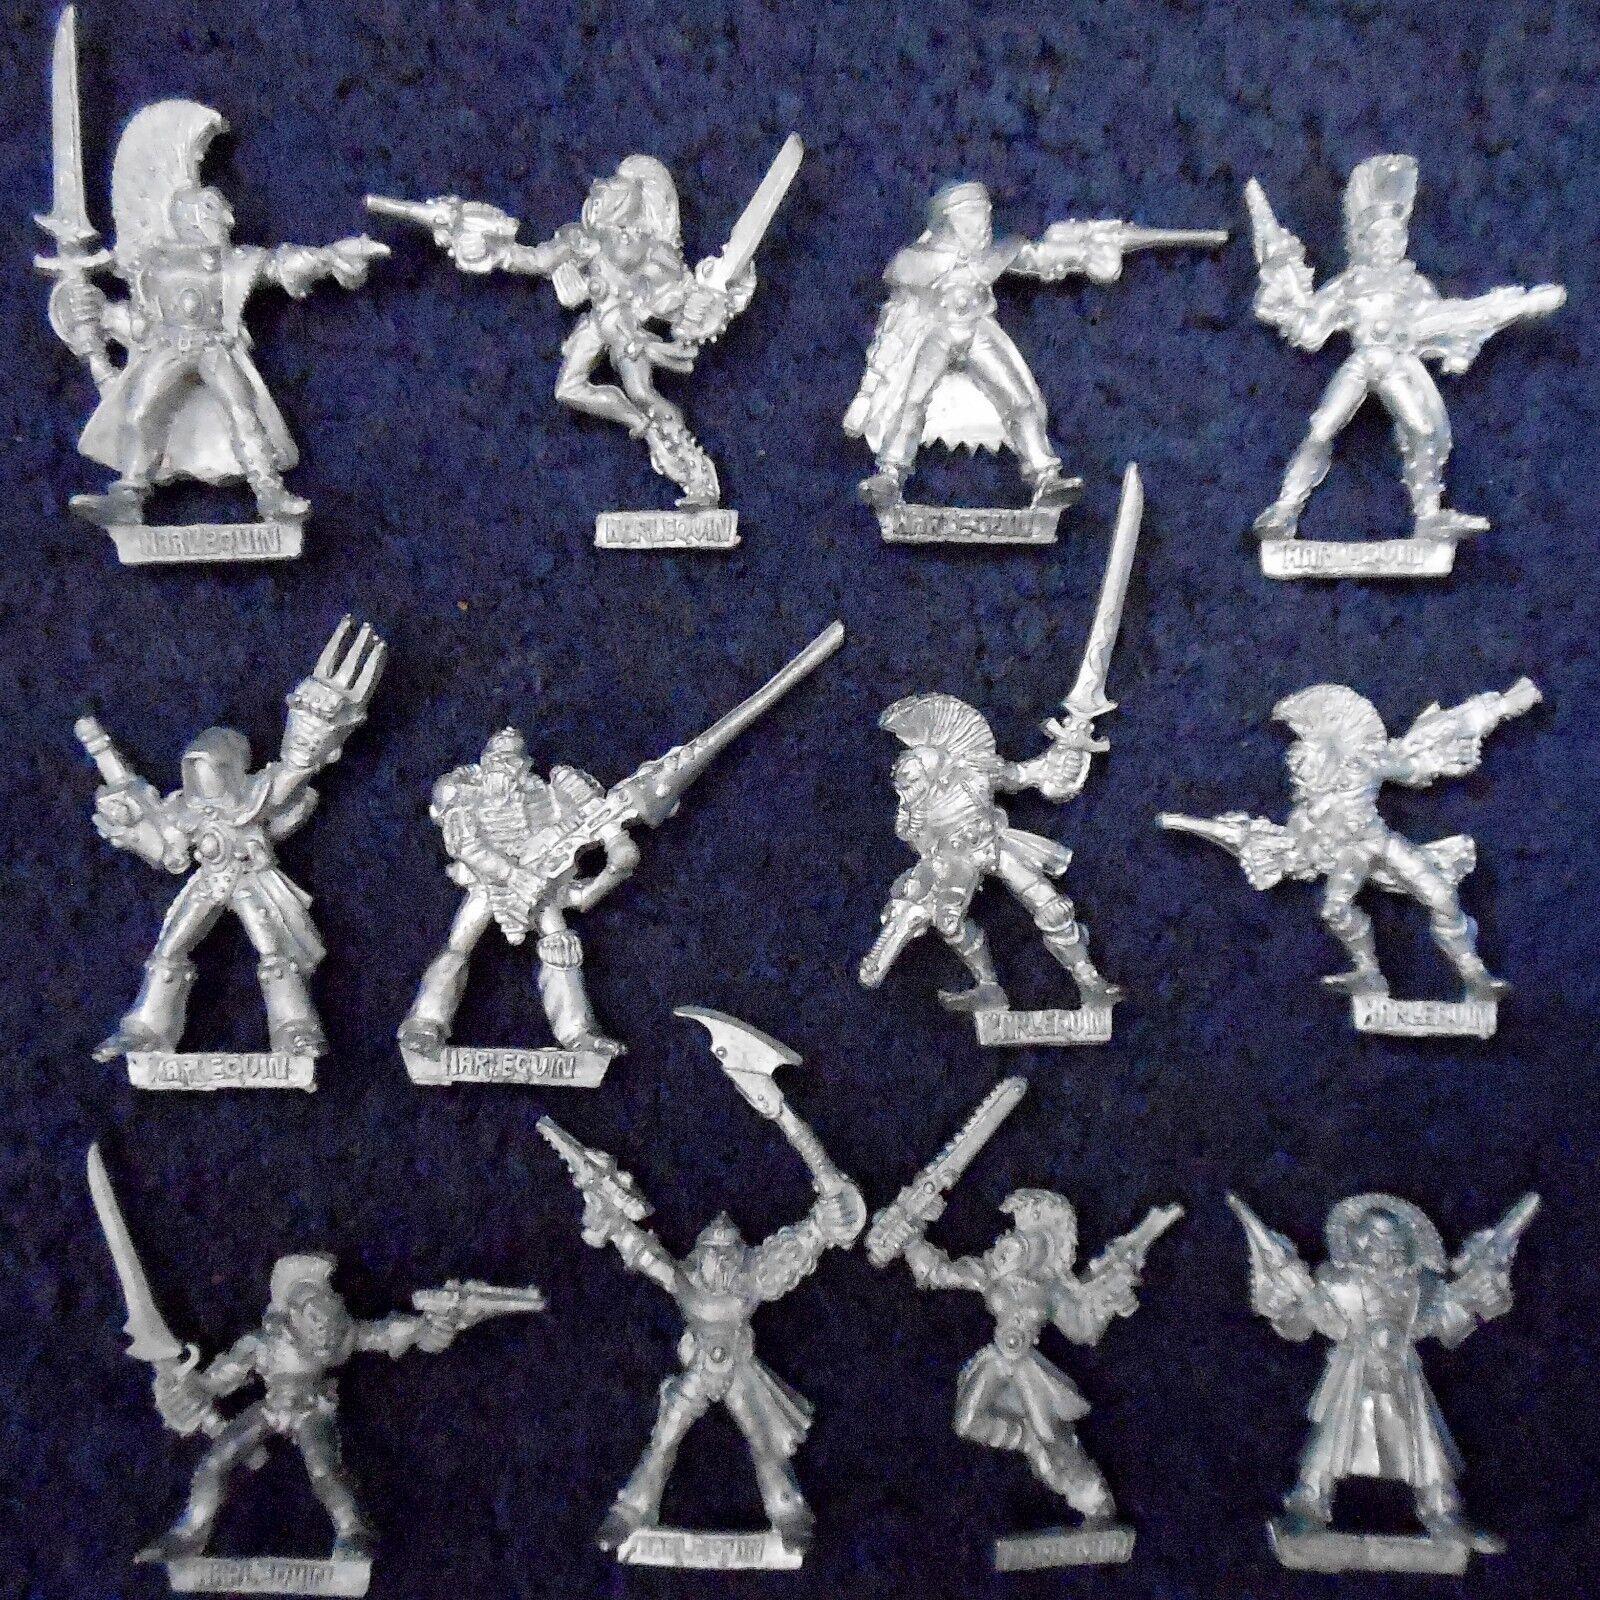 Harlequins 1988 Set B  Trouper Rogue Trader Eldar Harlequin Citadel Warhammer 40k  liquidazione